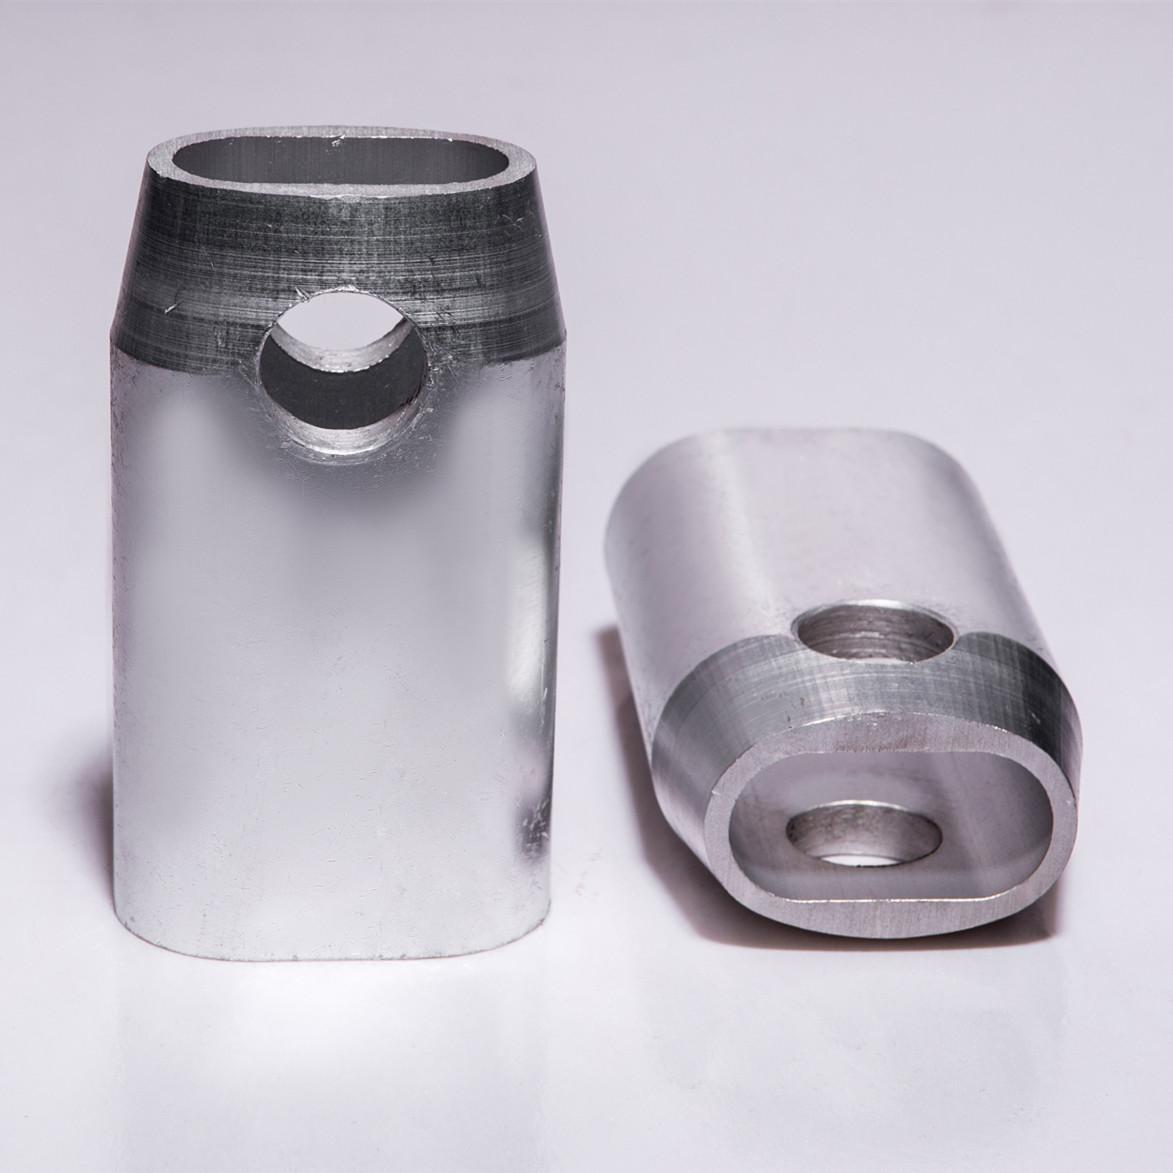 https://www.fayean-ssfittings.com/img/aluminium_ferrules_form_c.jpg